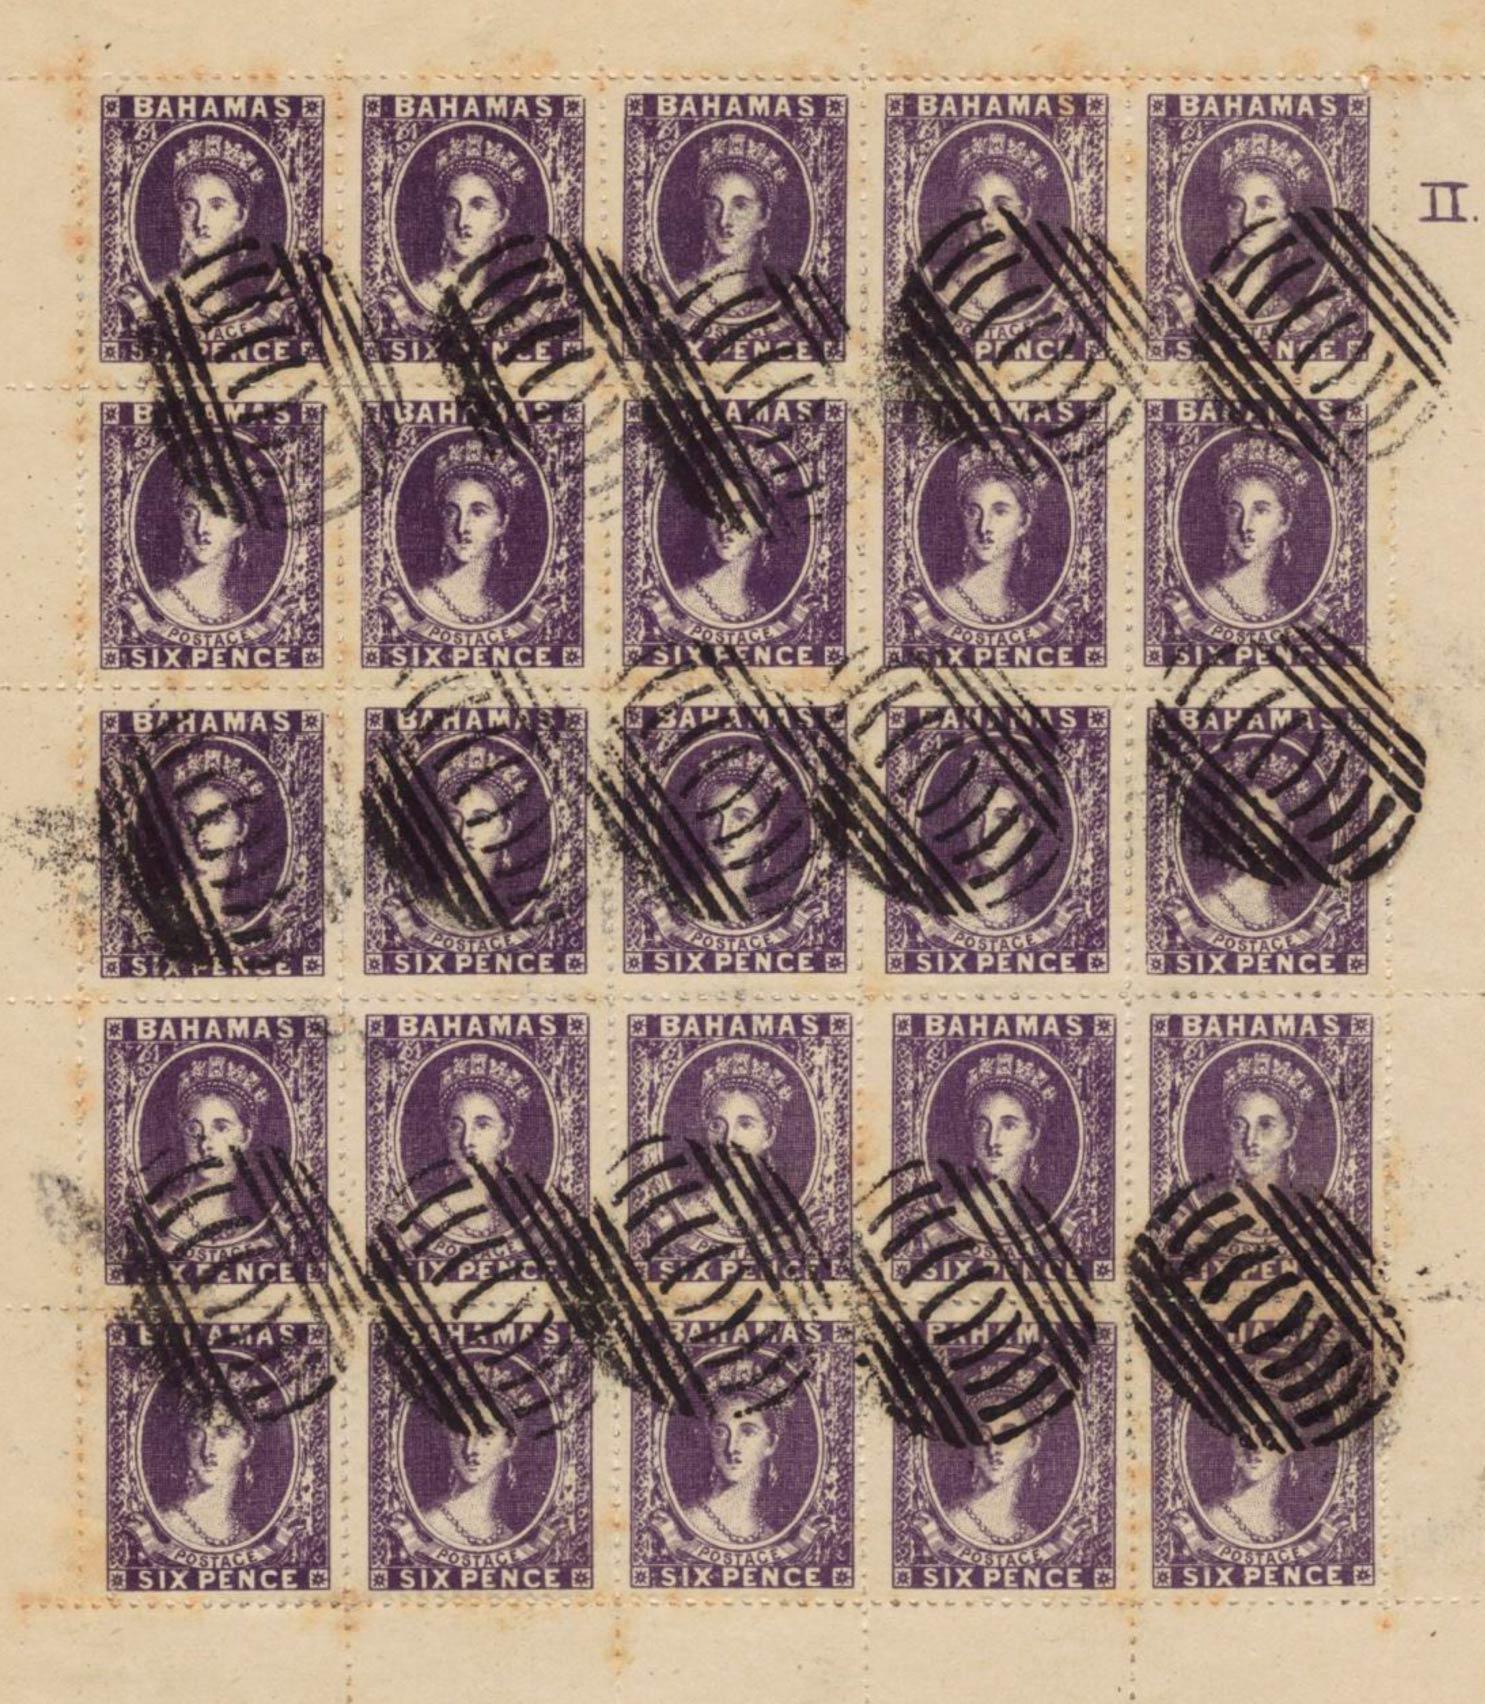 Bahamas_1861_6d_Spiro-sheet_Forgery